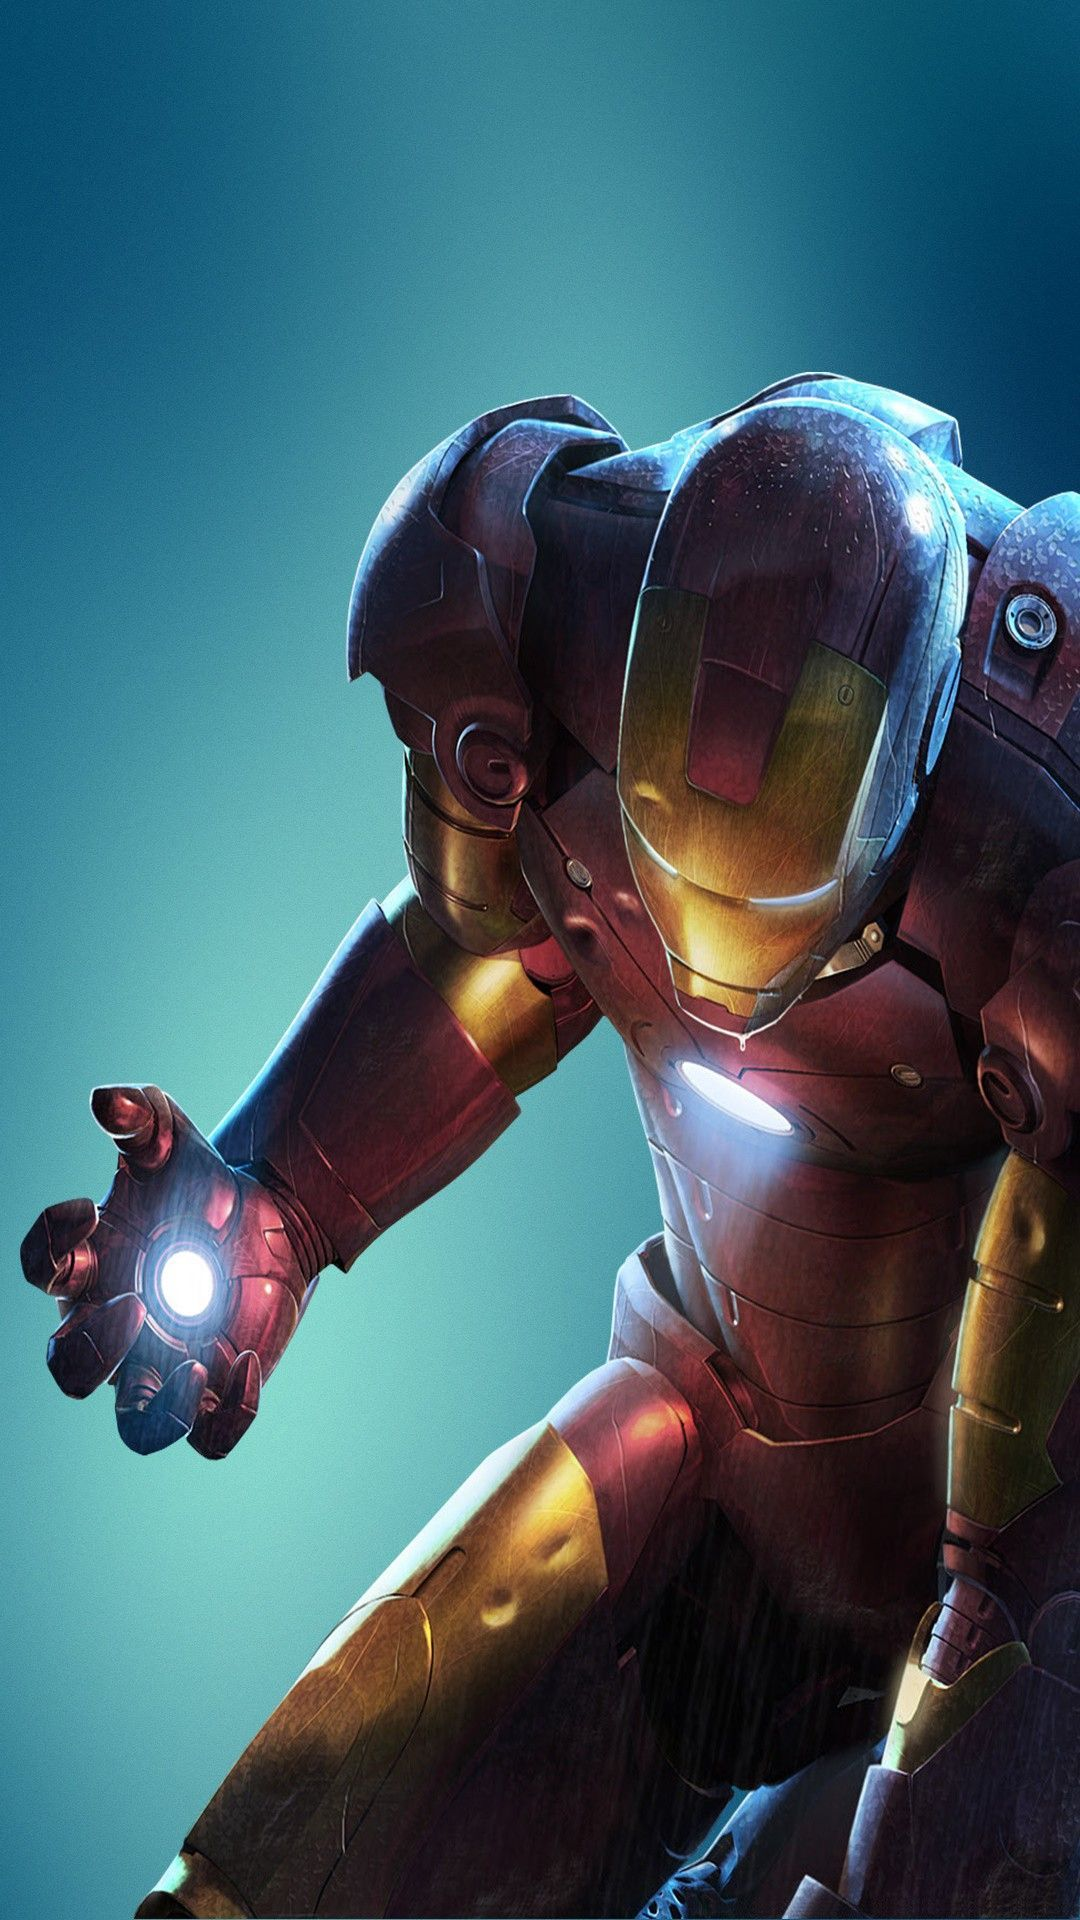 Iron Man D iOS 11 wallpaper